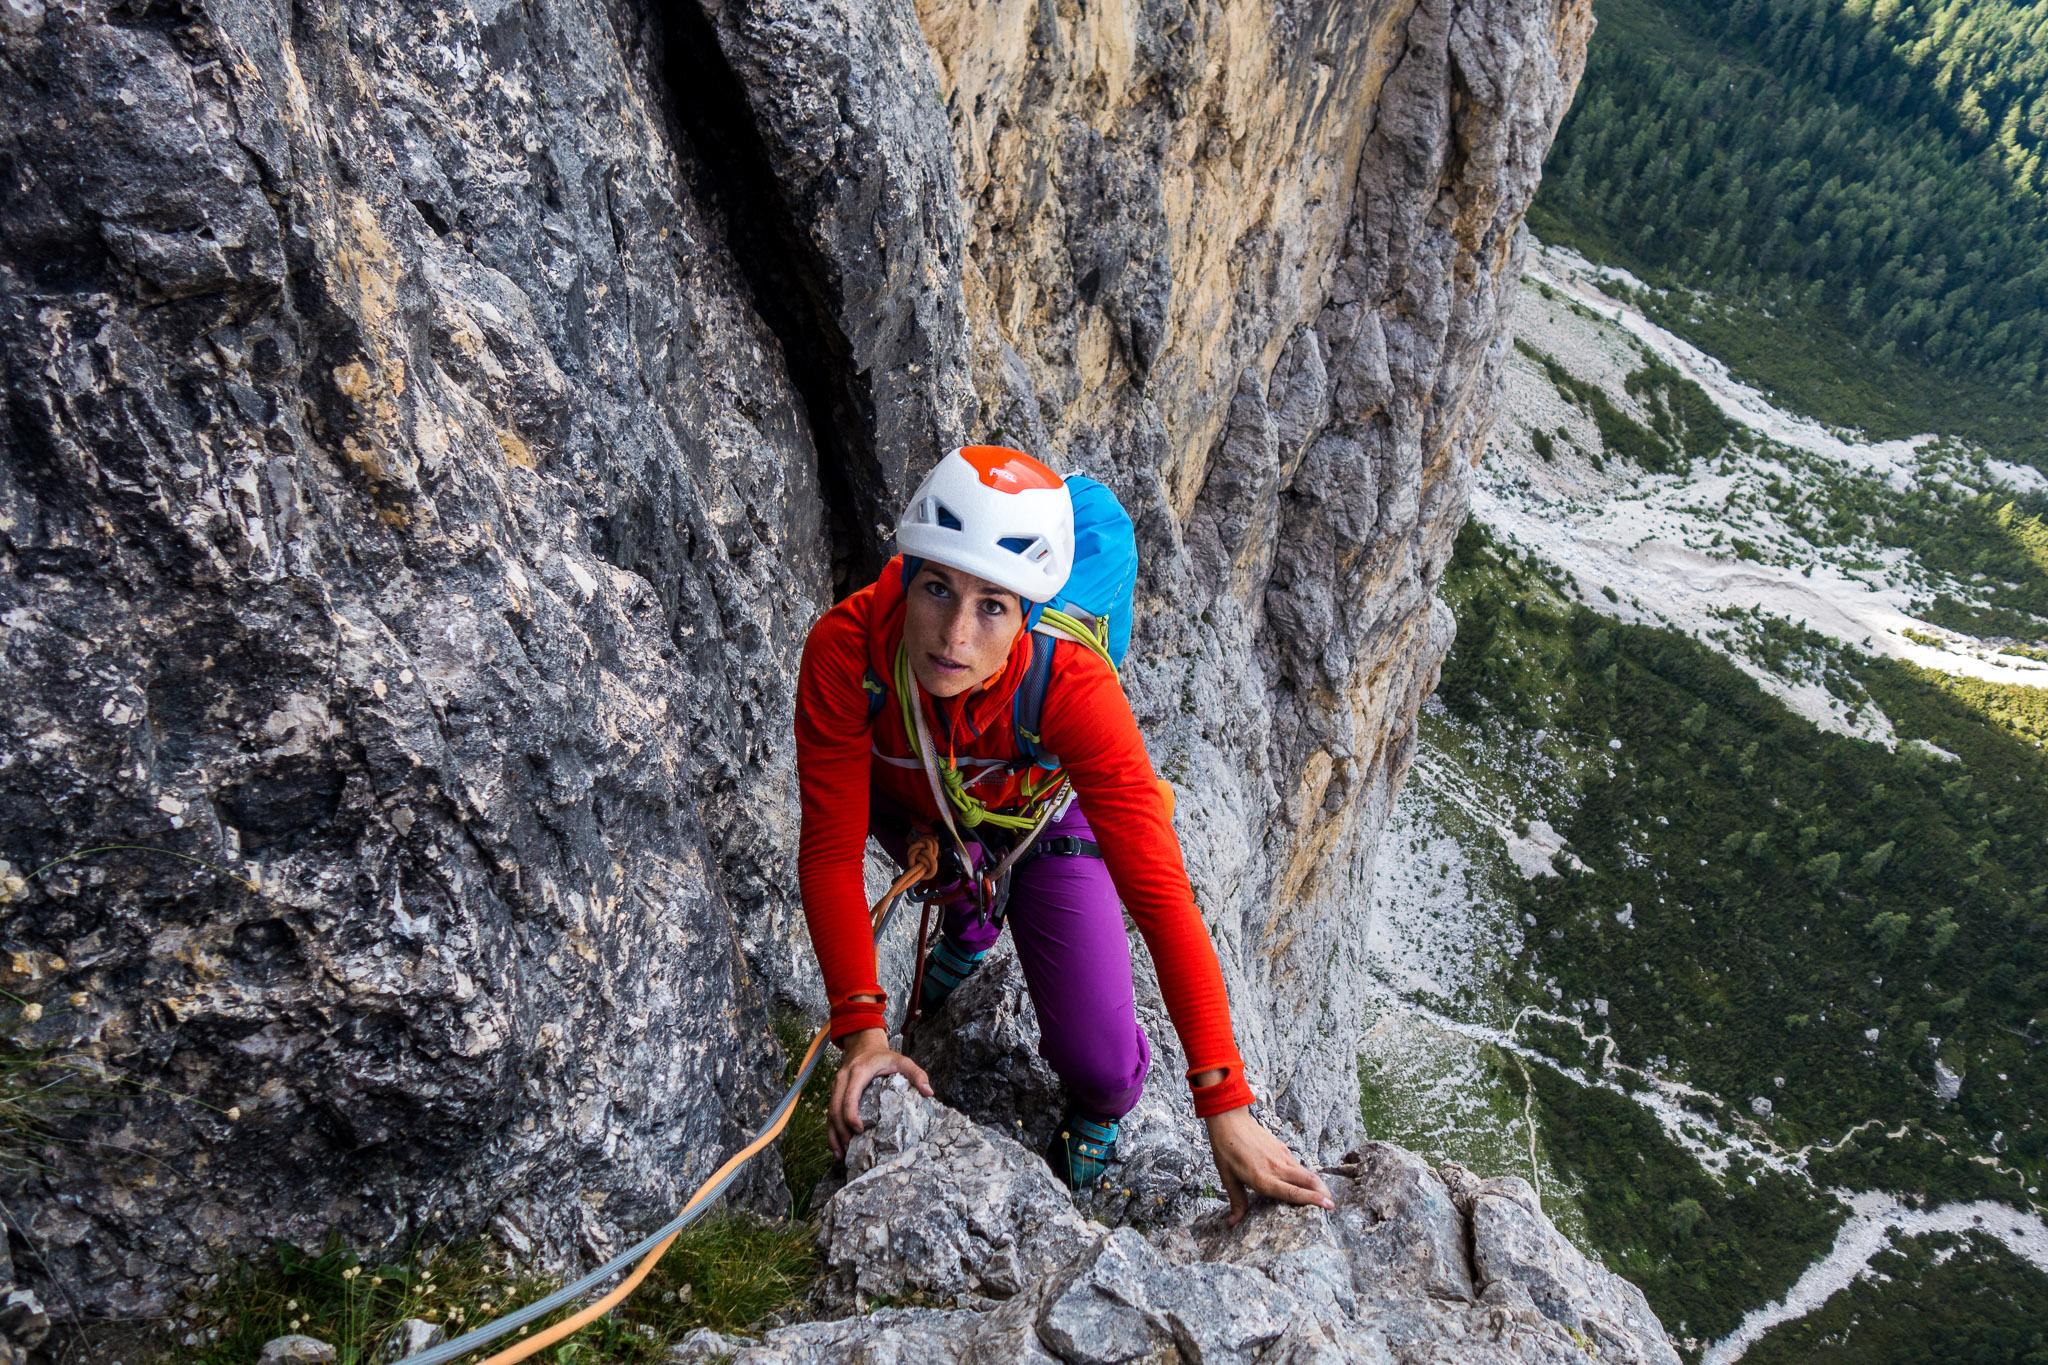 Klettergurt Alpinklettern : Alpinklettern dolomiten fedele dibona pordoi sella